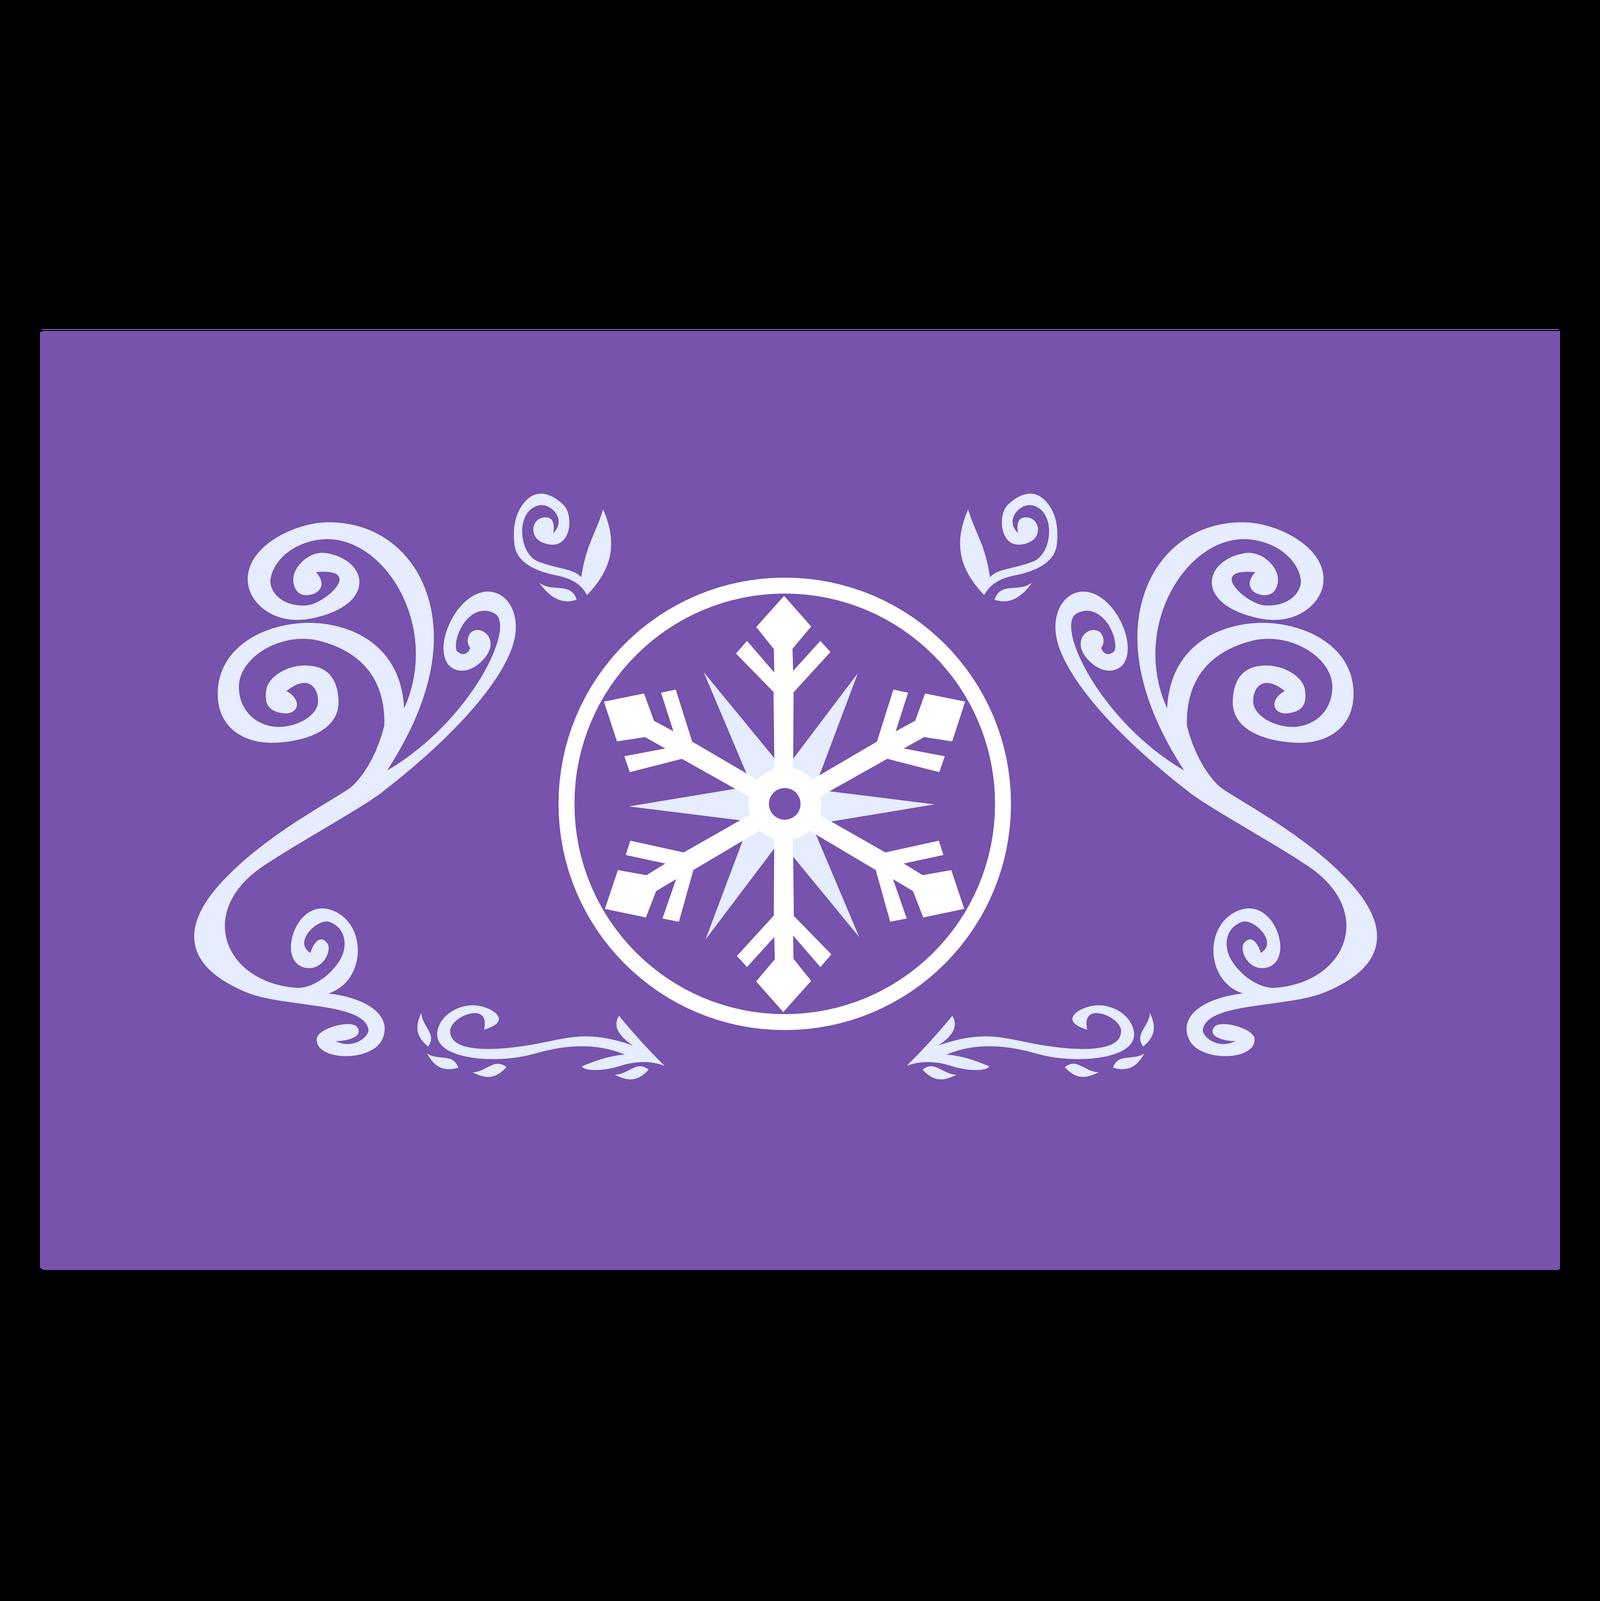 A New Flag by Chritsel